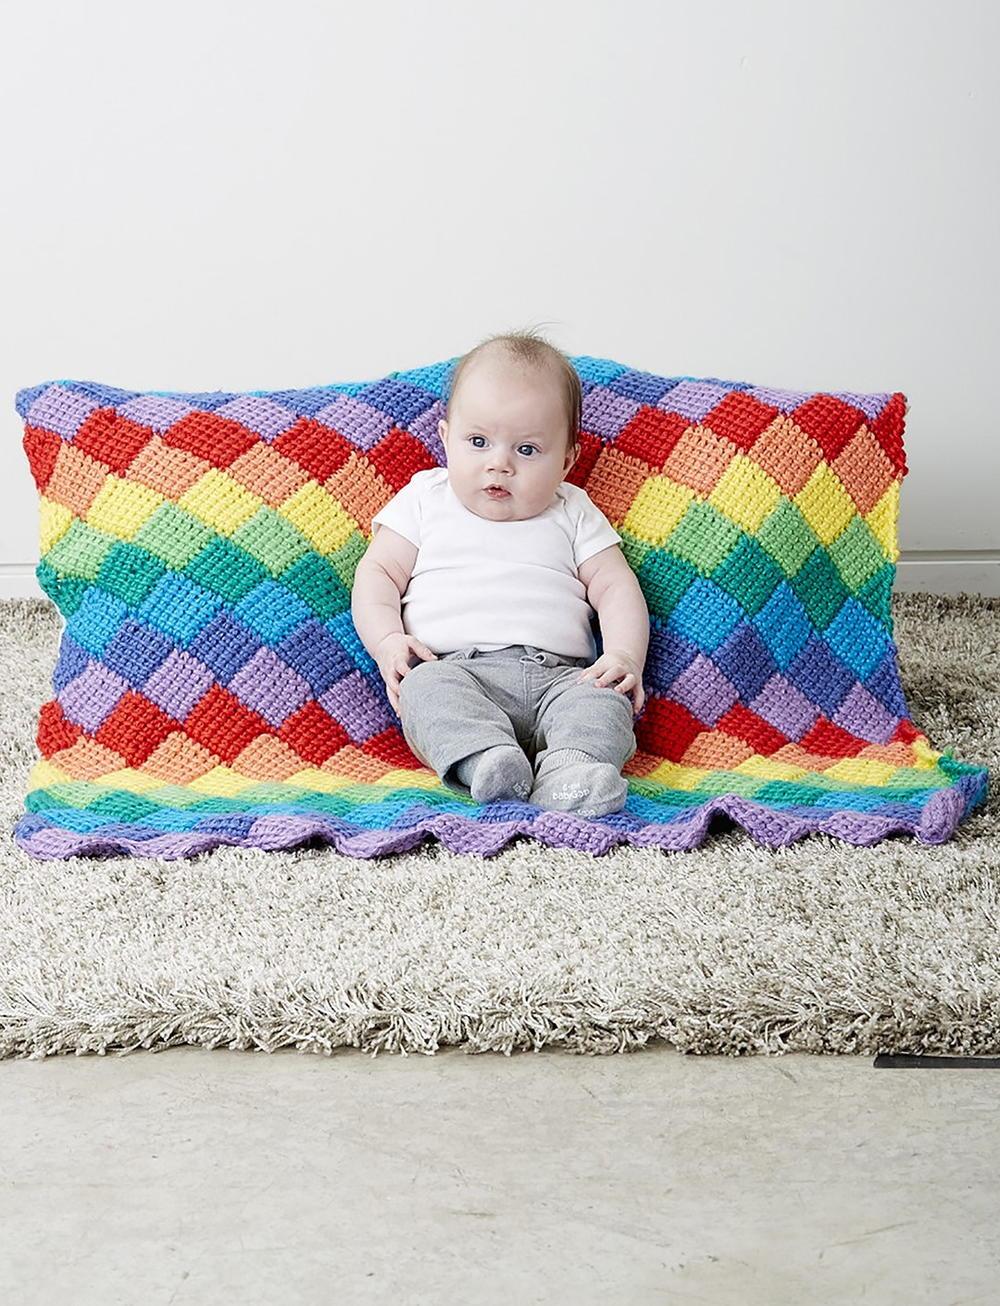 Rainbow Tunisian Crochet Baby Blanket Pattern | AllFreeCrochet.com